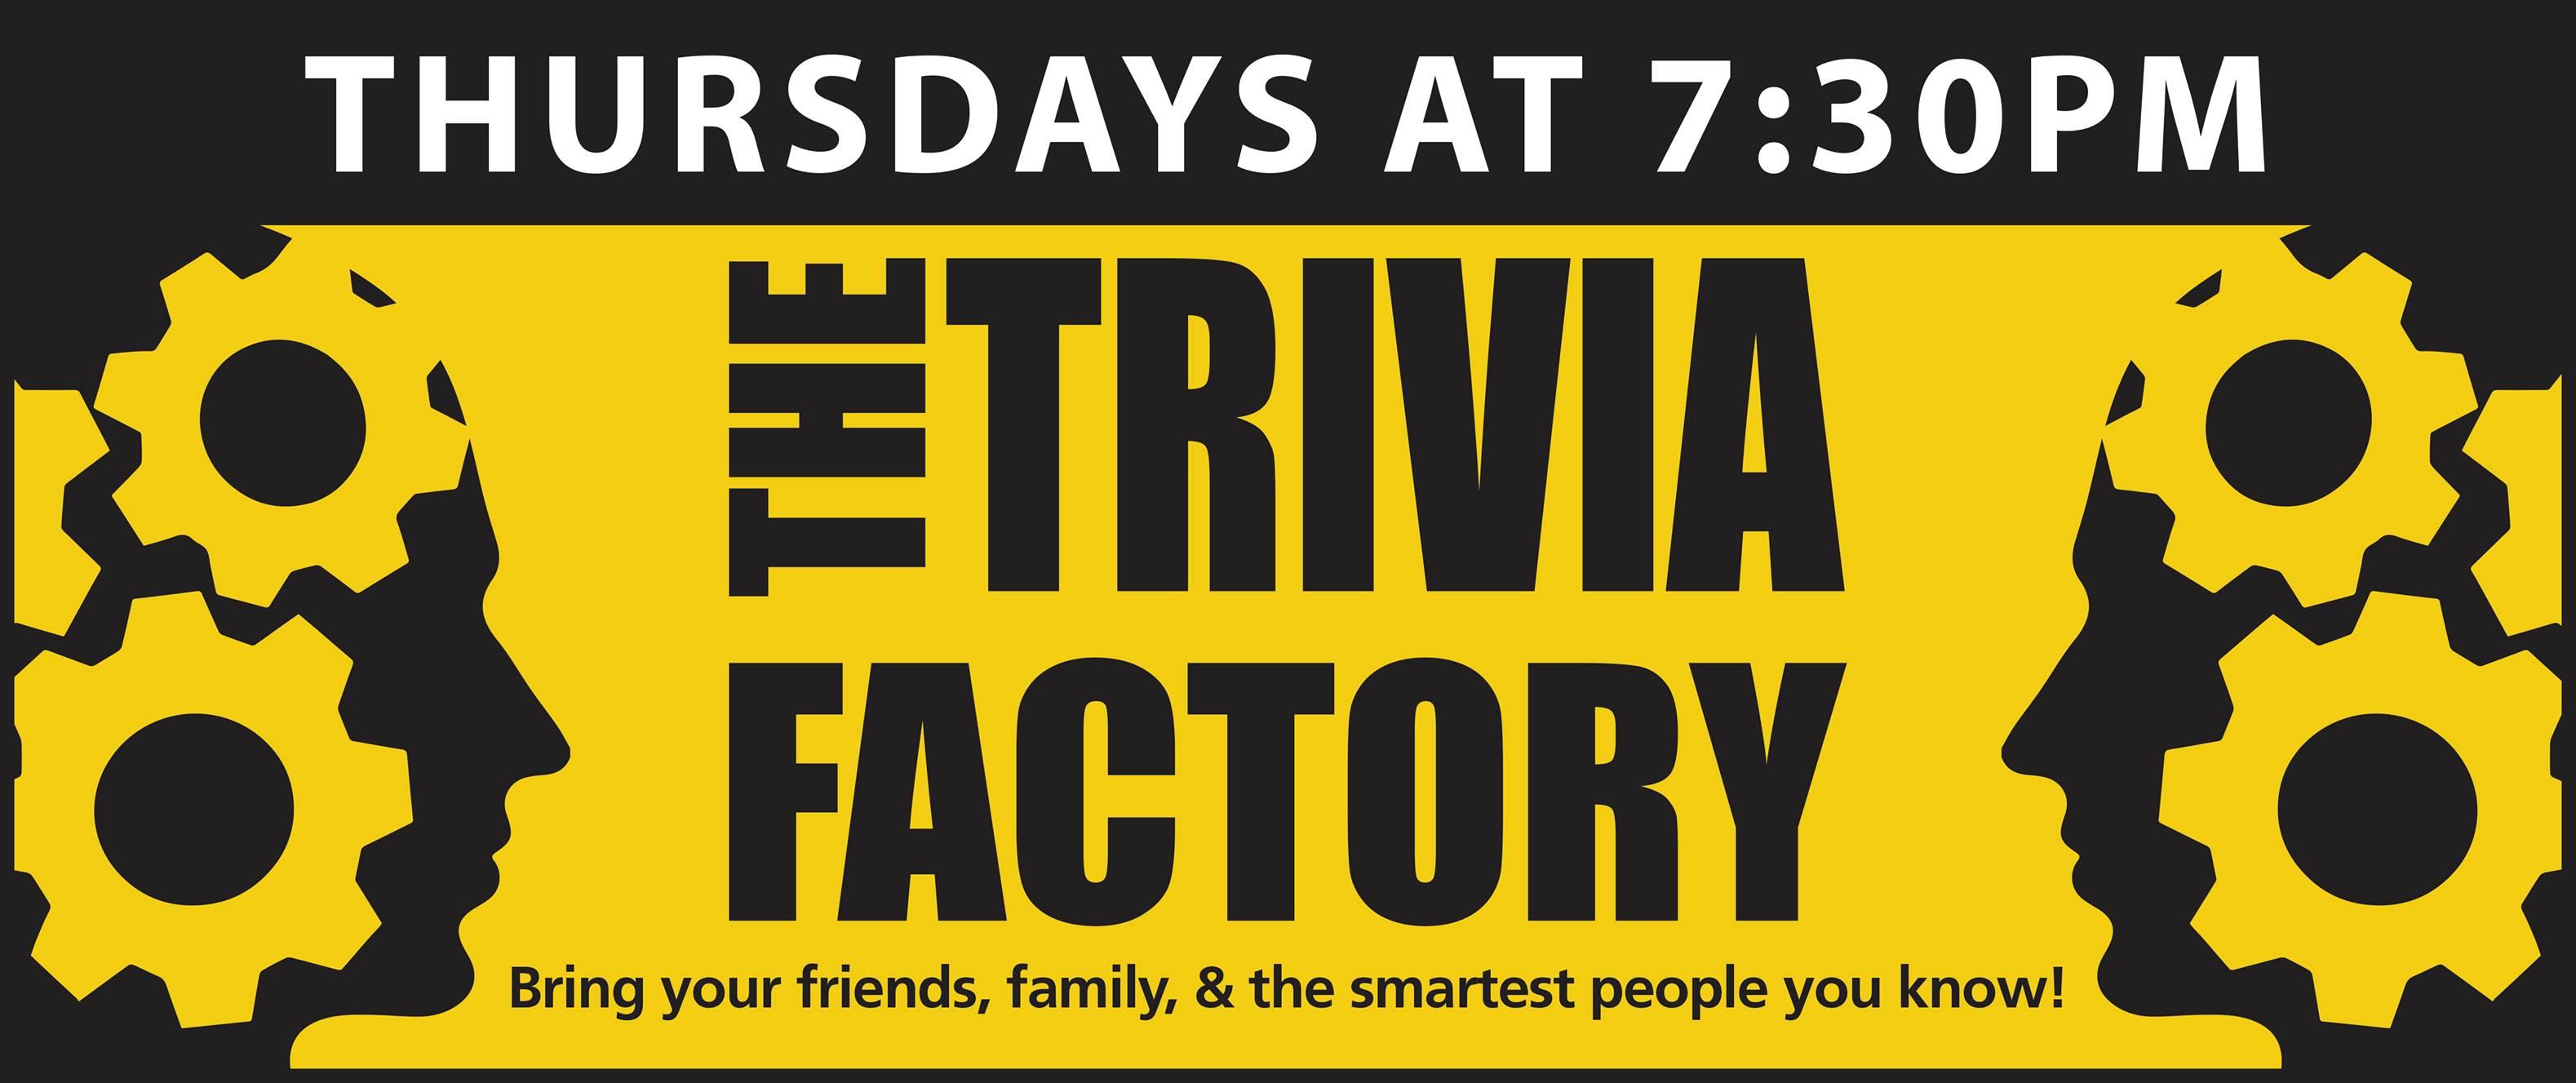 Trivia Factory